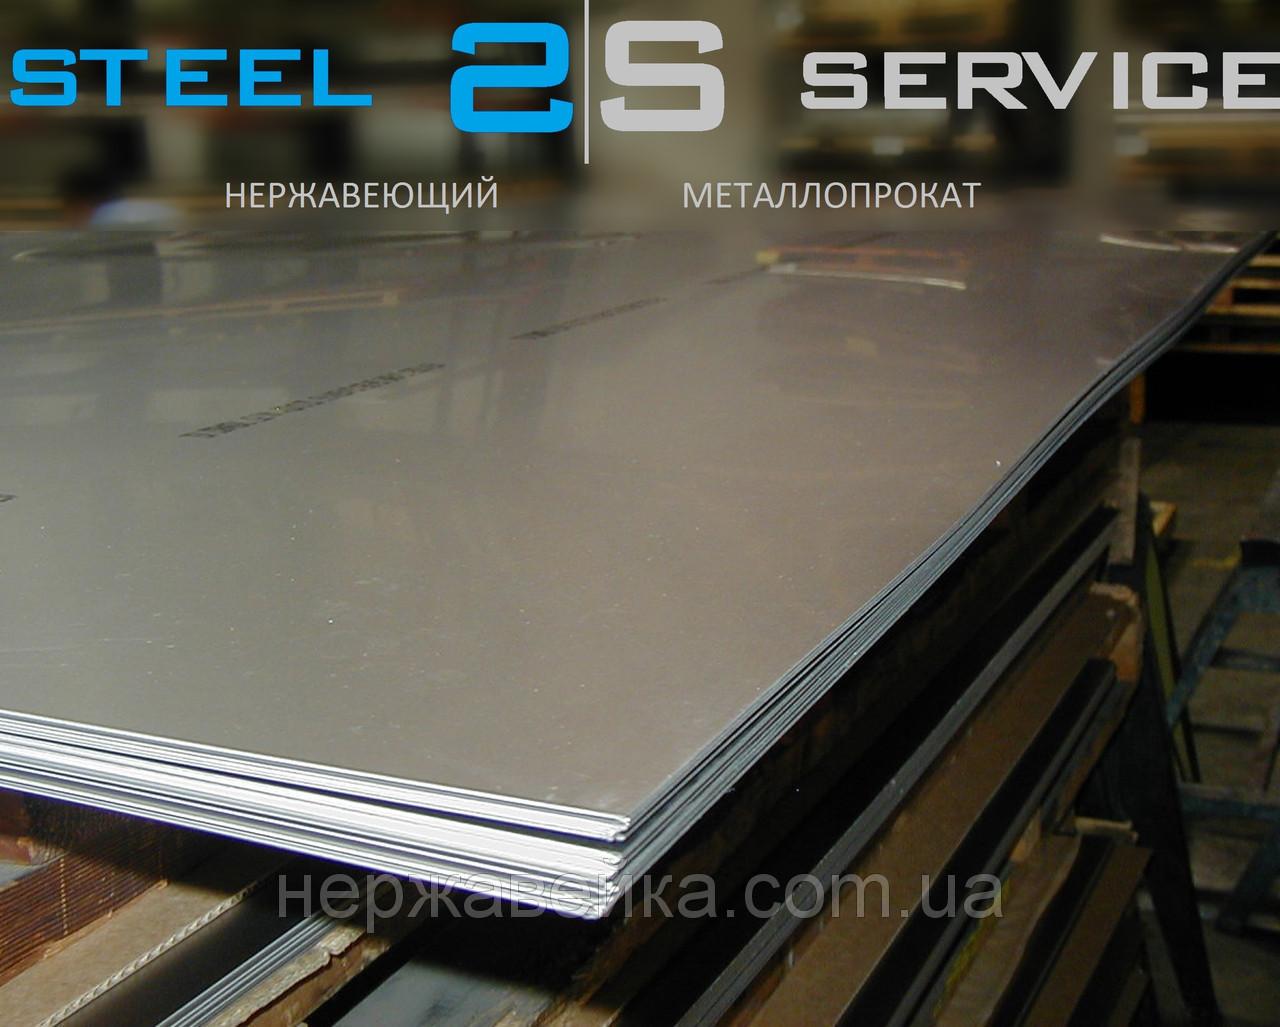 Нержавейка лист 0,8х1500х3000мм AISI 430(12Х17) 2B - матовый, технический